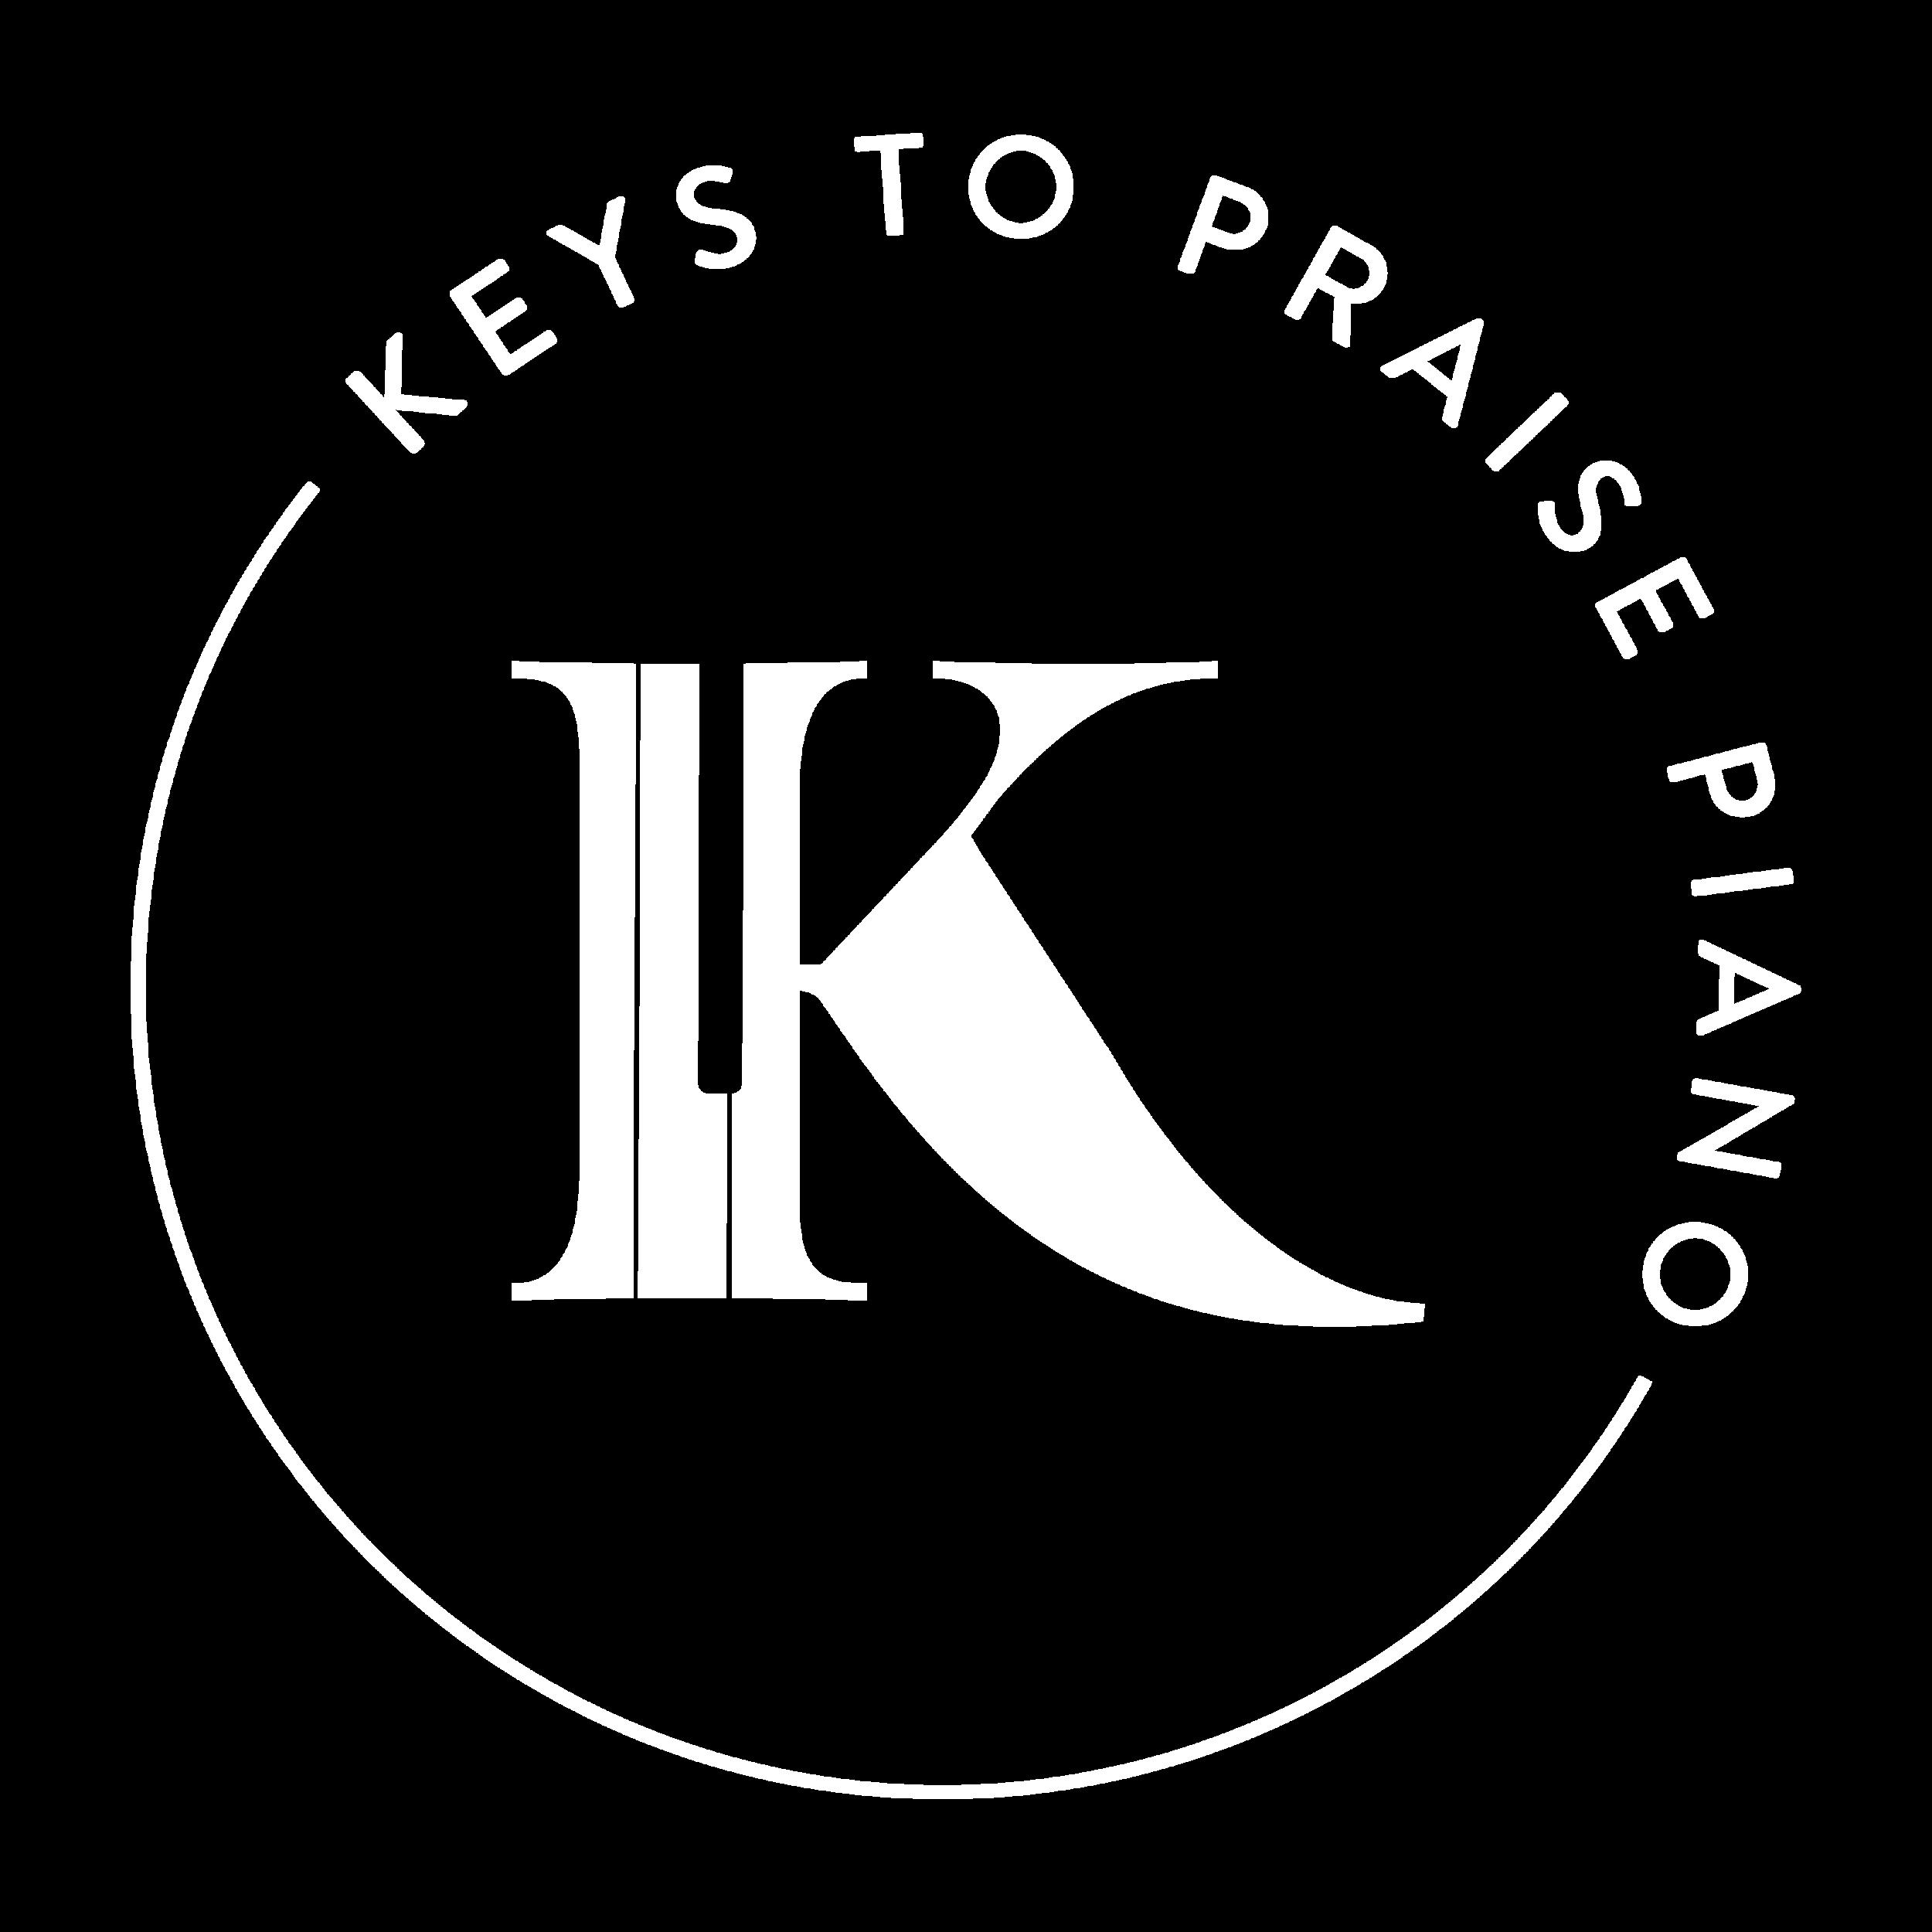 Keys+To+Praise+Piano-White-03.png